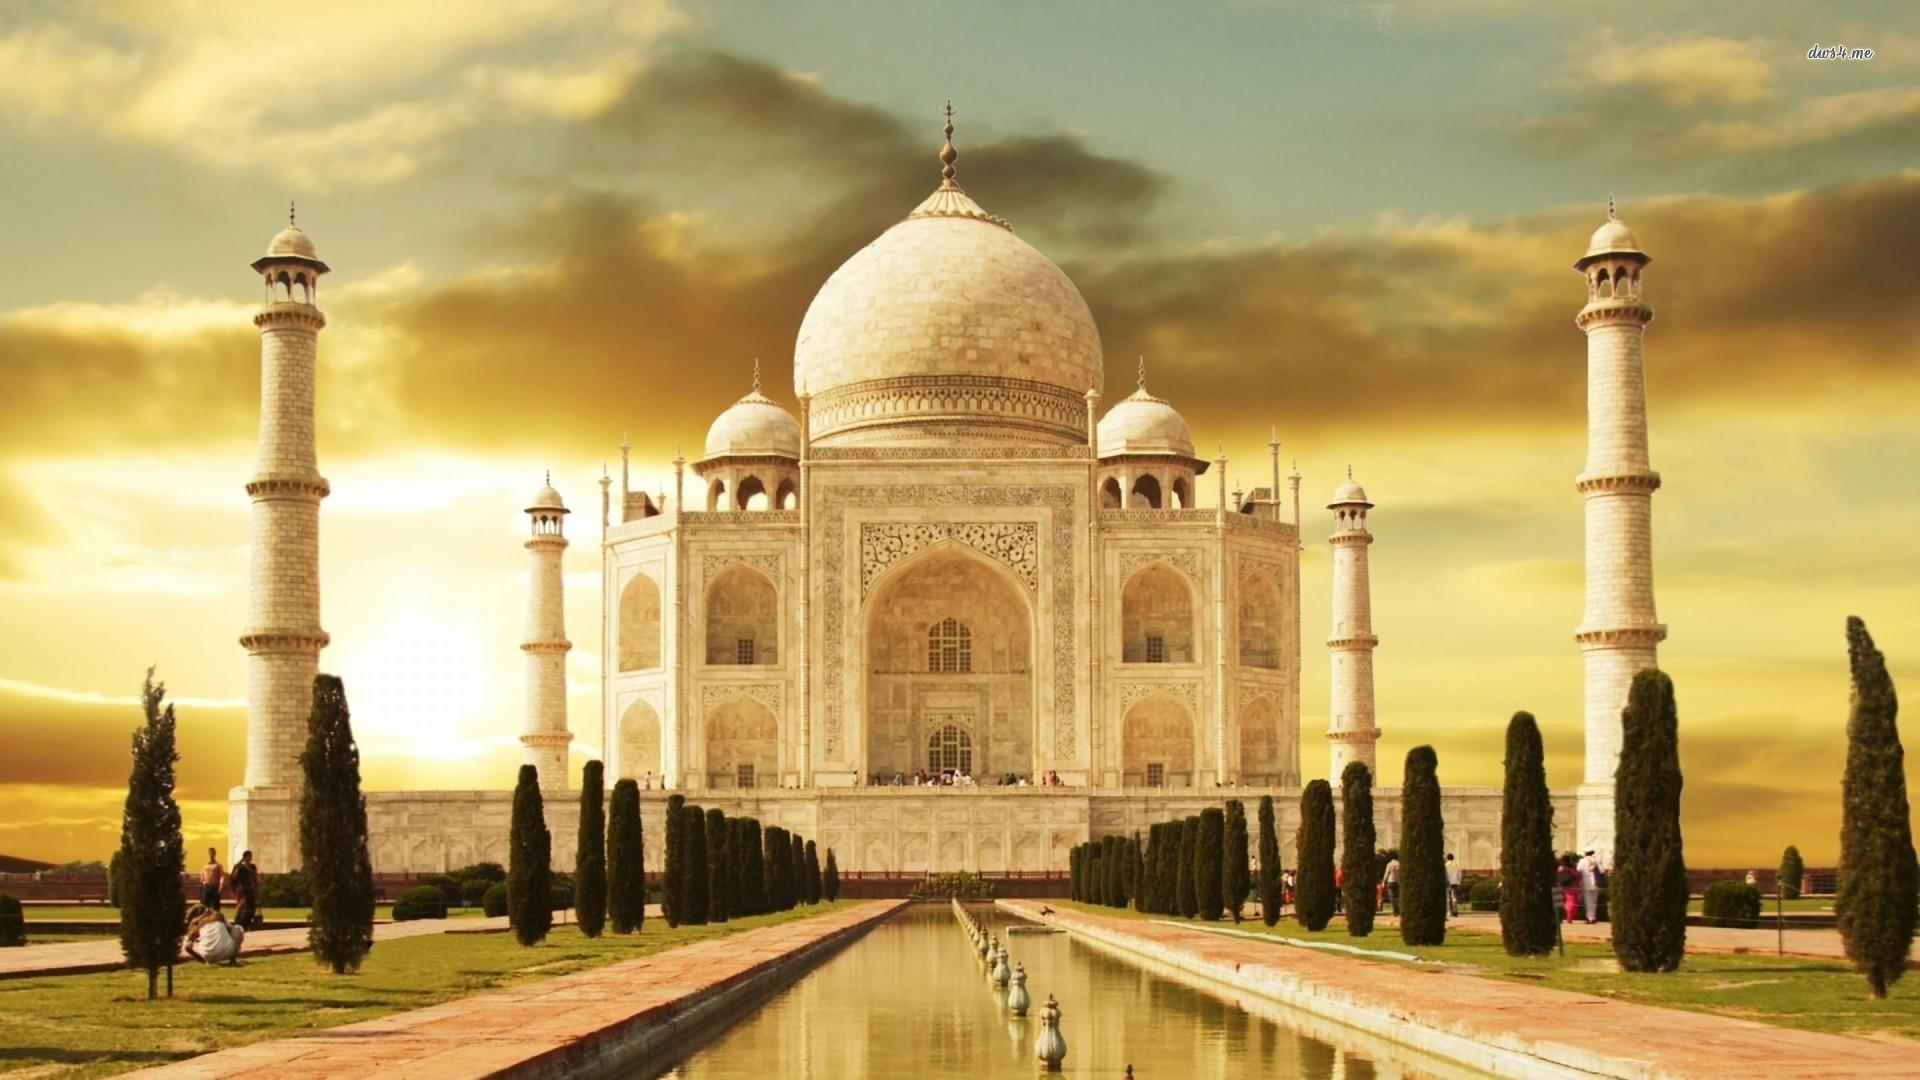 india wallpaper desktop ·①